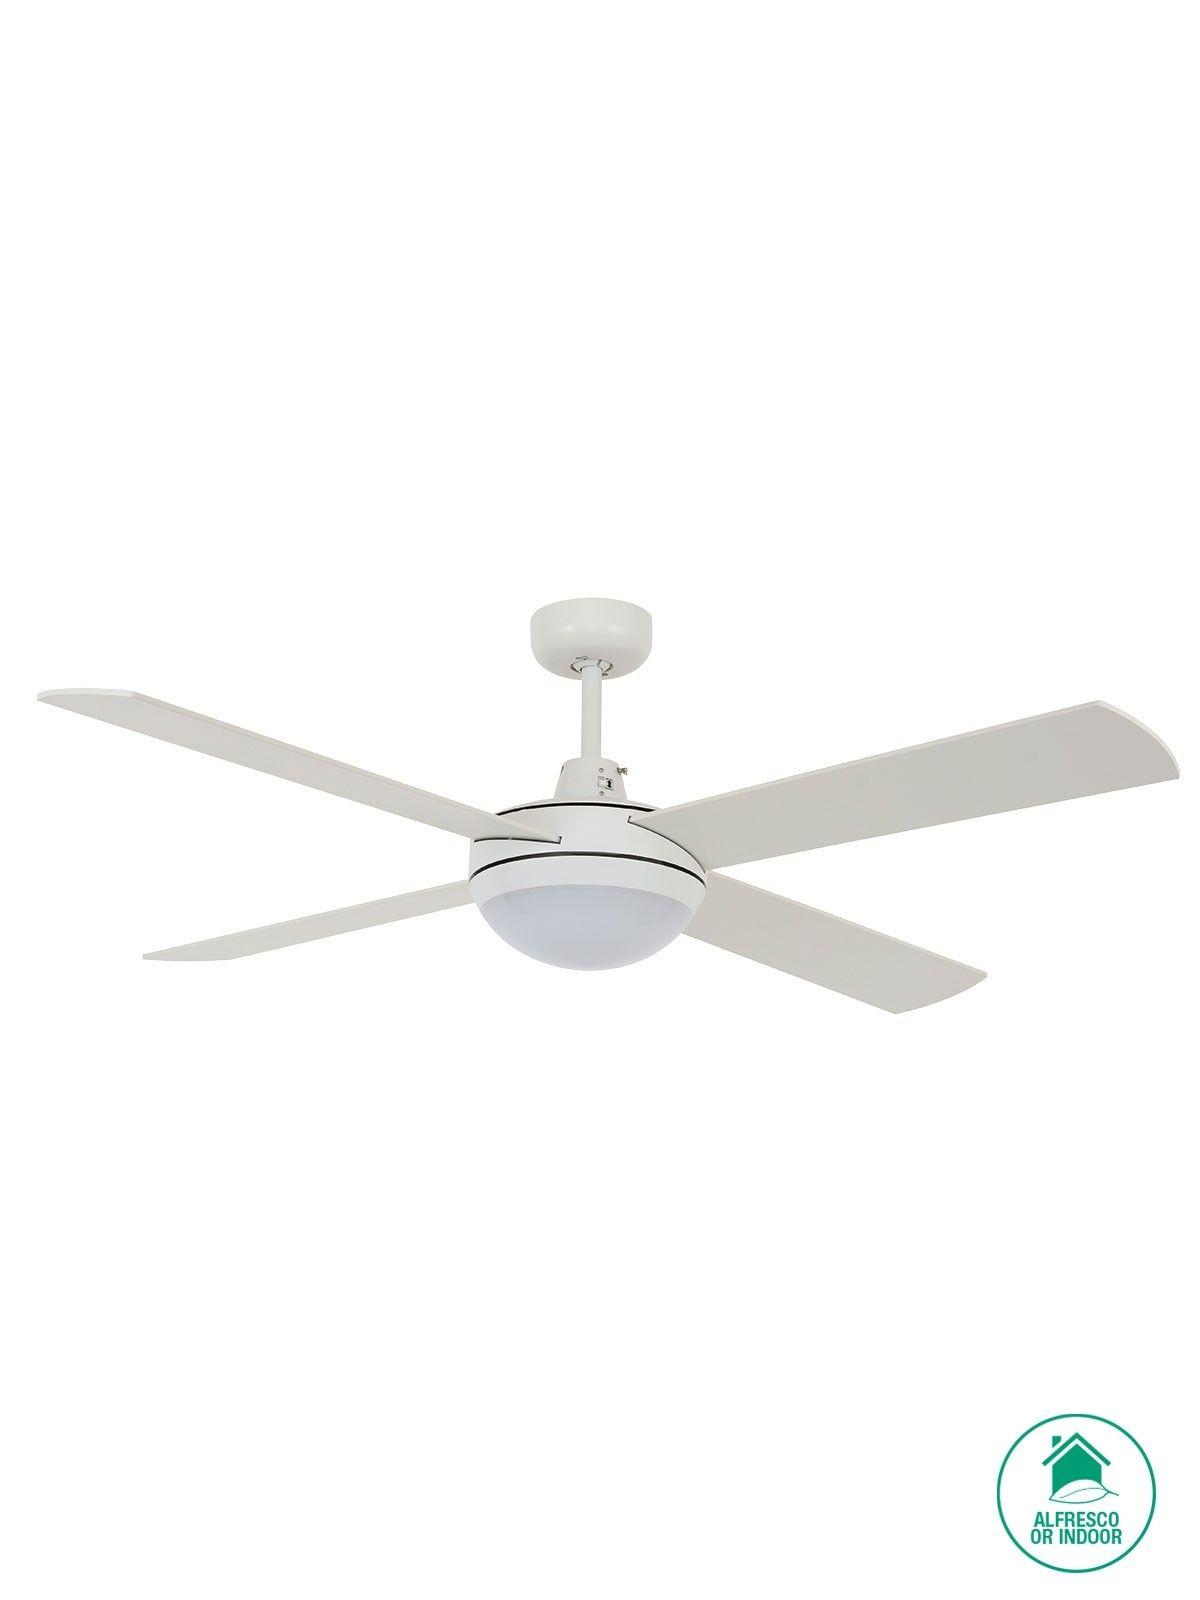 Futura mood 132cm fan and led light in white lighting pinterest futura mood 132cm fan and led light in white aloadofball Gallery